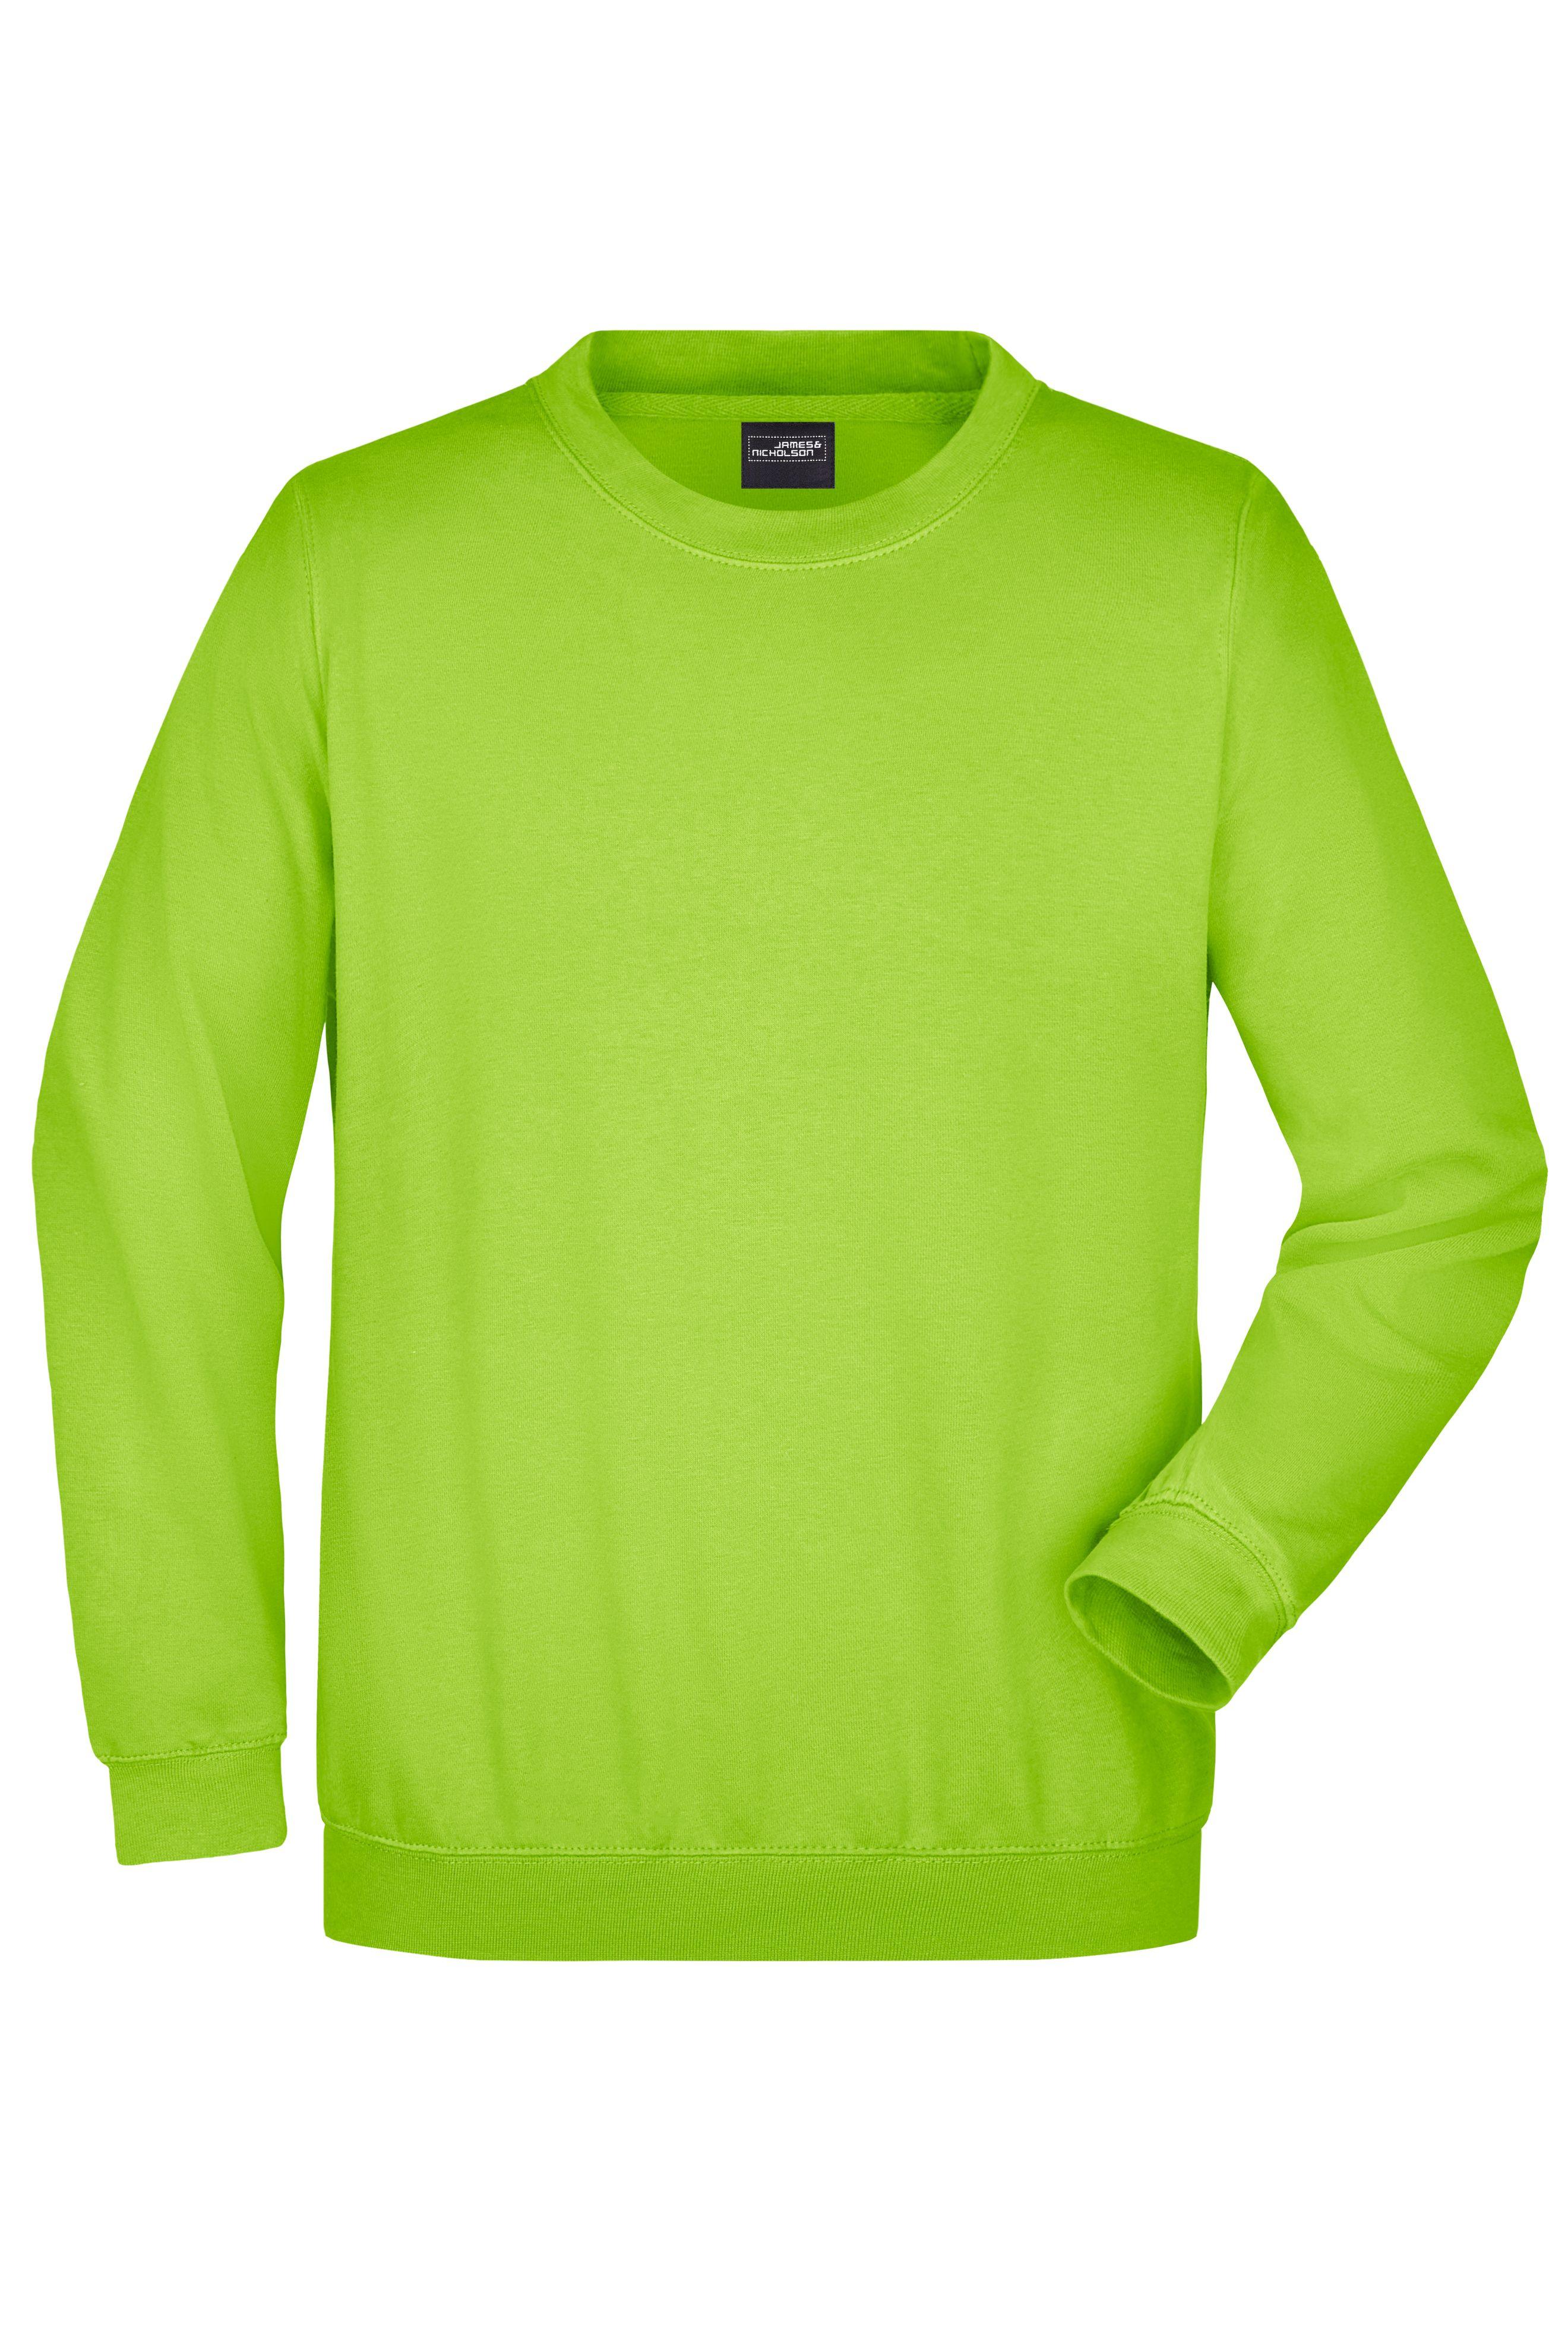 Klassisches Komfort Rundhals-Sweatshirt